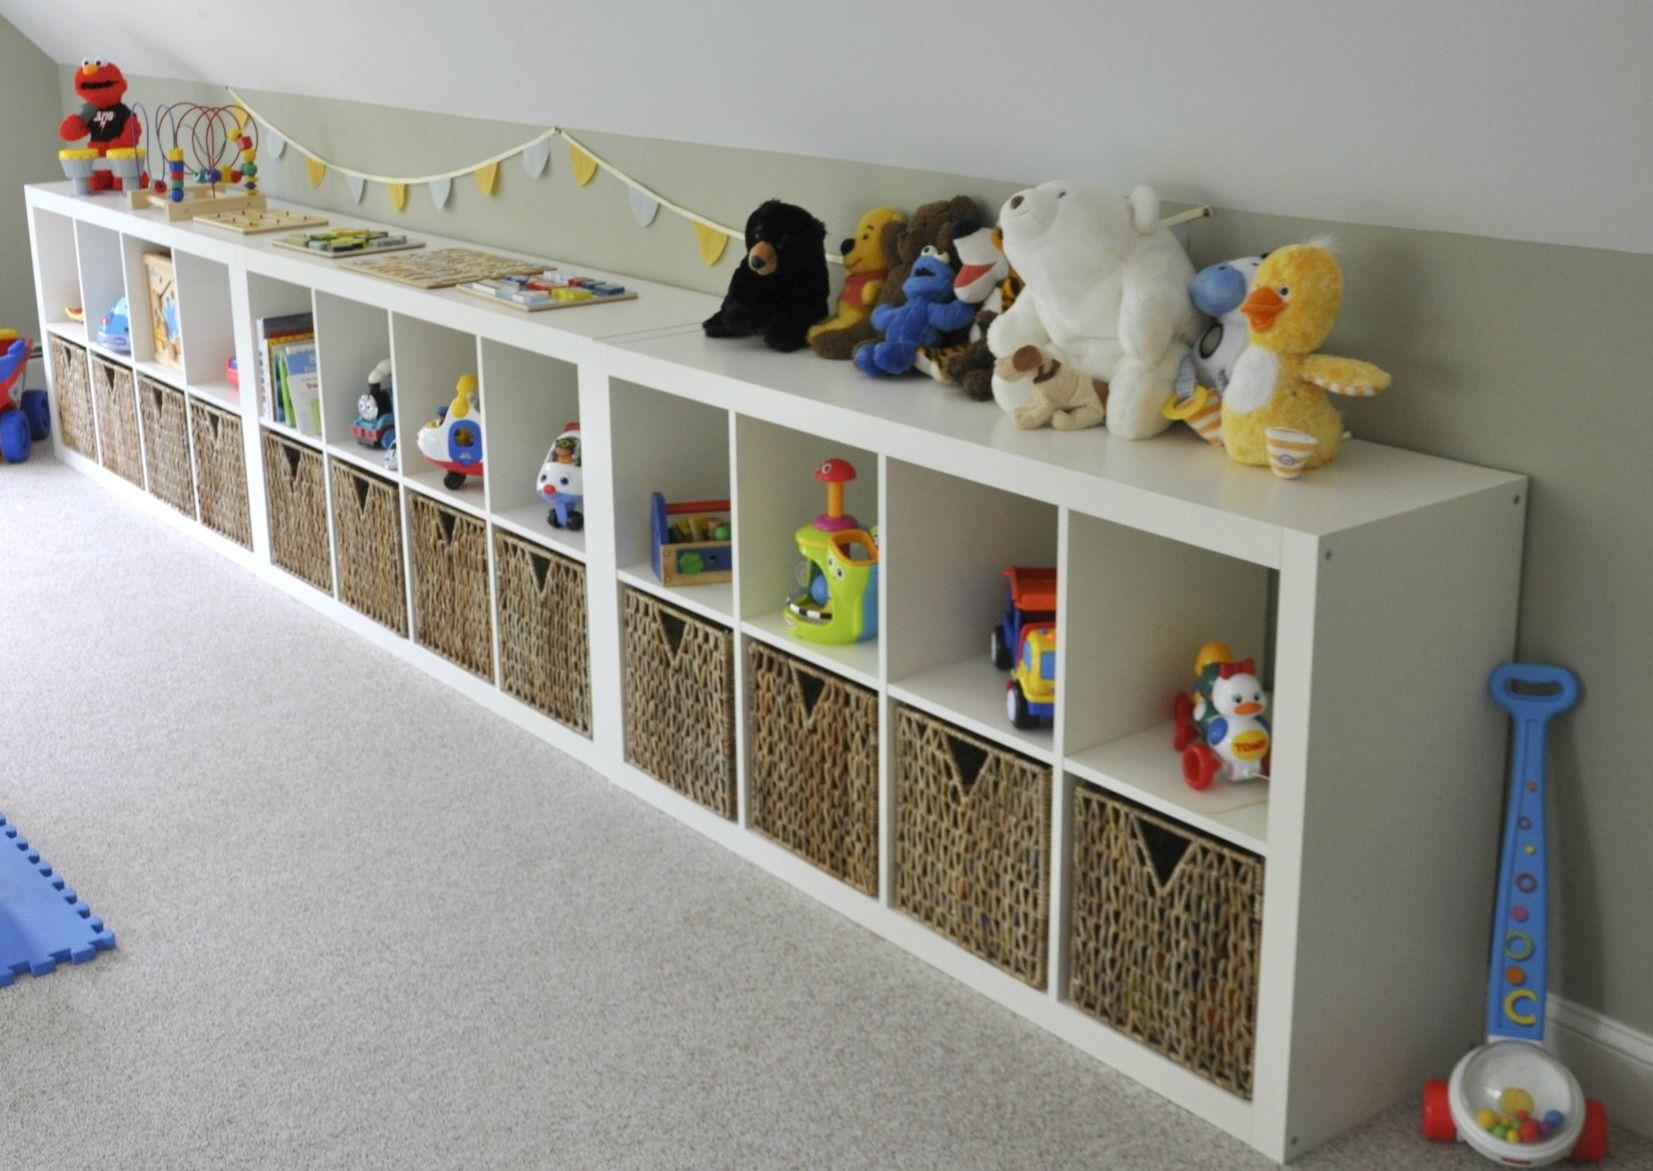 ikea expedit playroom storage reveal kids pinterest. Black Bedroom Furniture Sets. Home Design Ideas